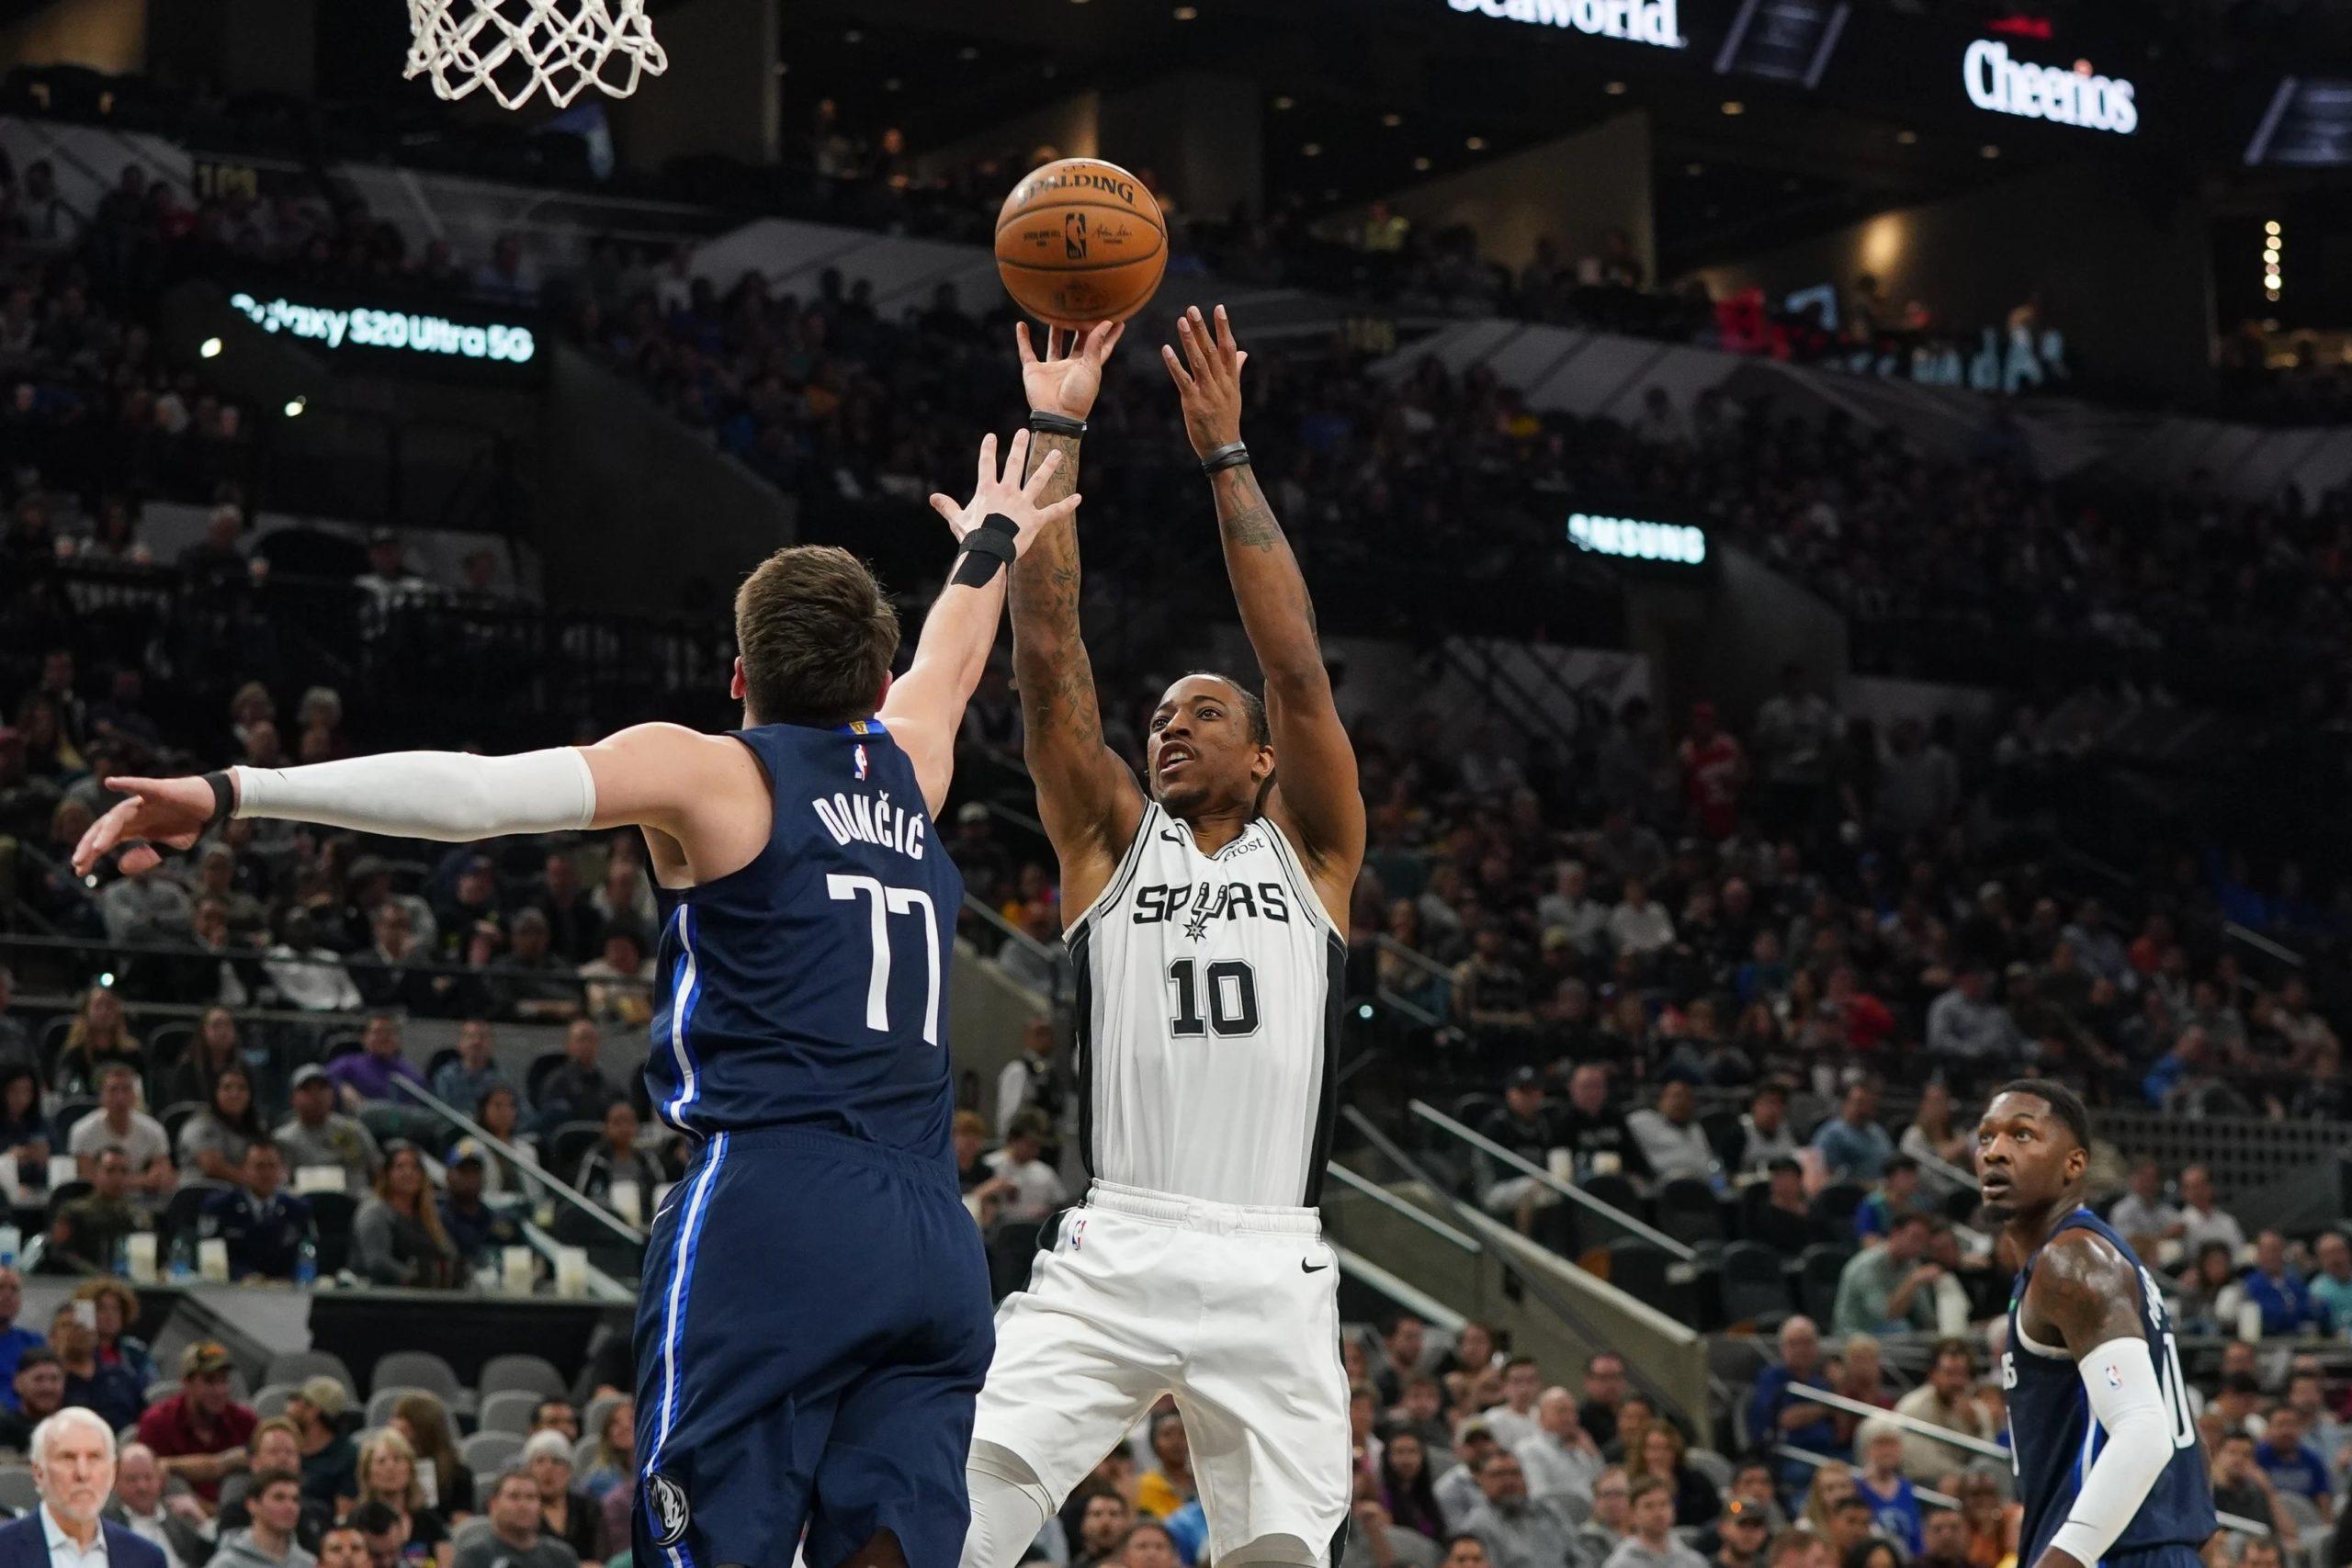 Mavericks vs Spurs #10 shooting a 2 pointer in the zone